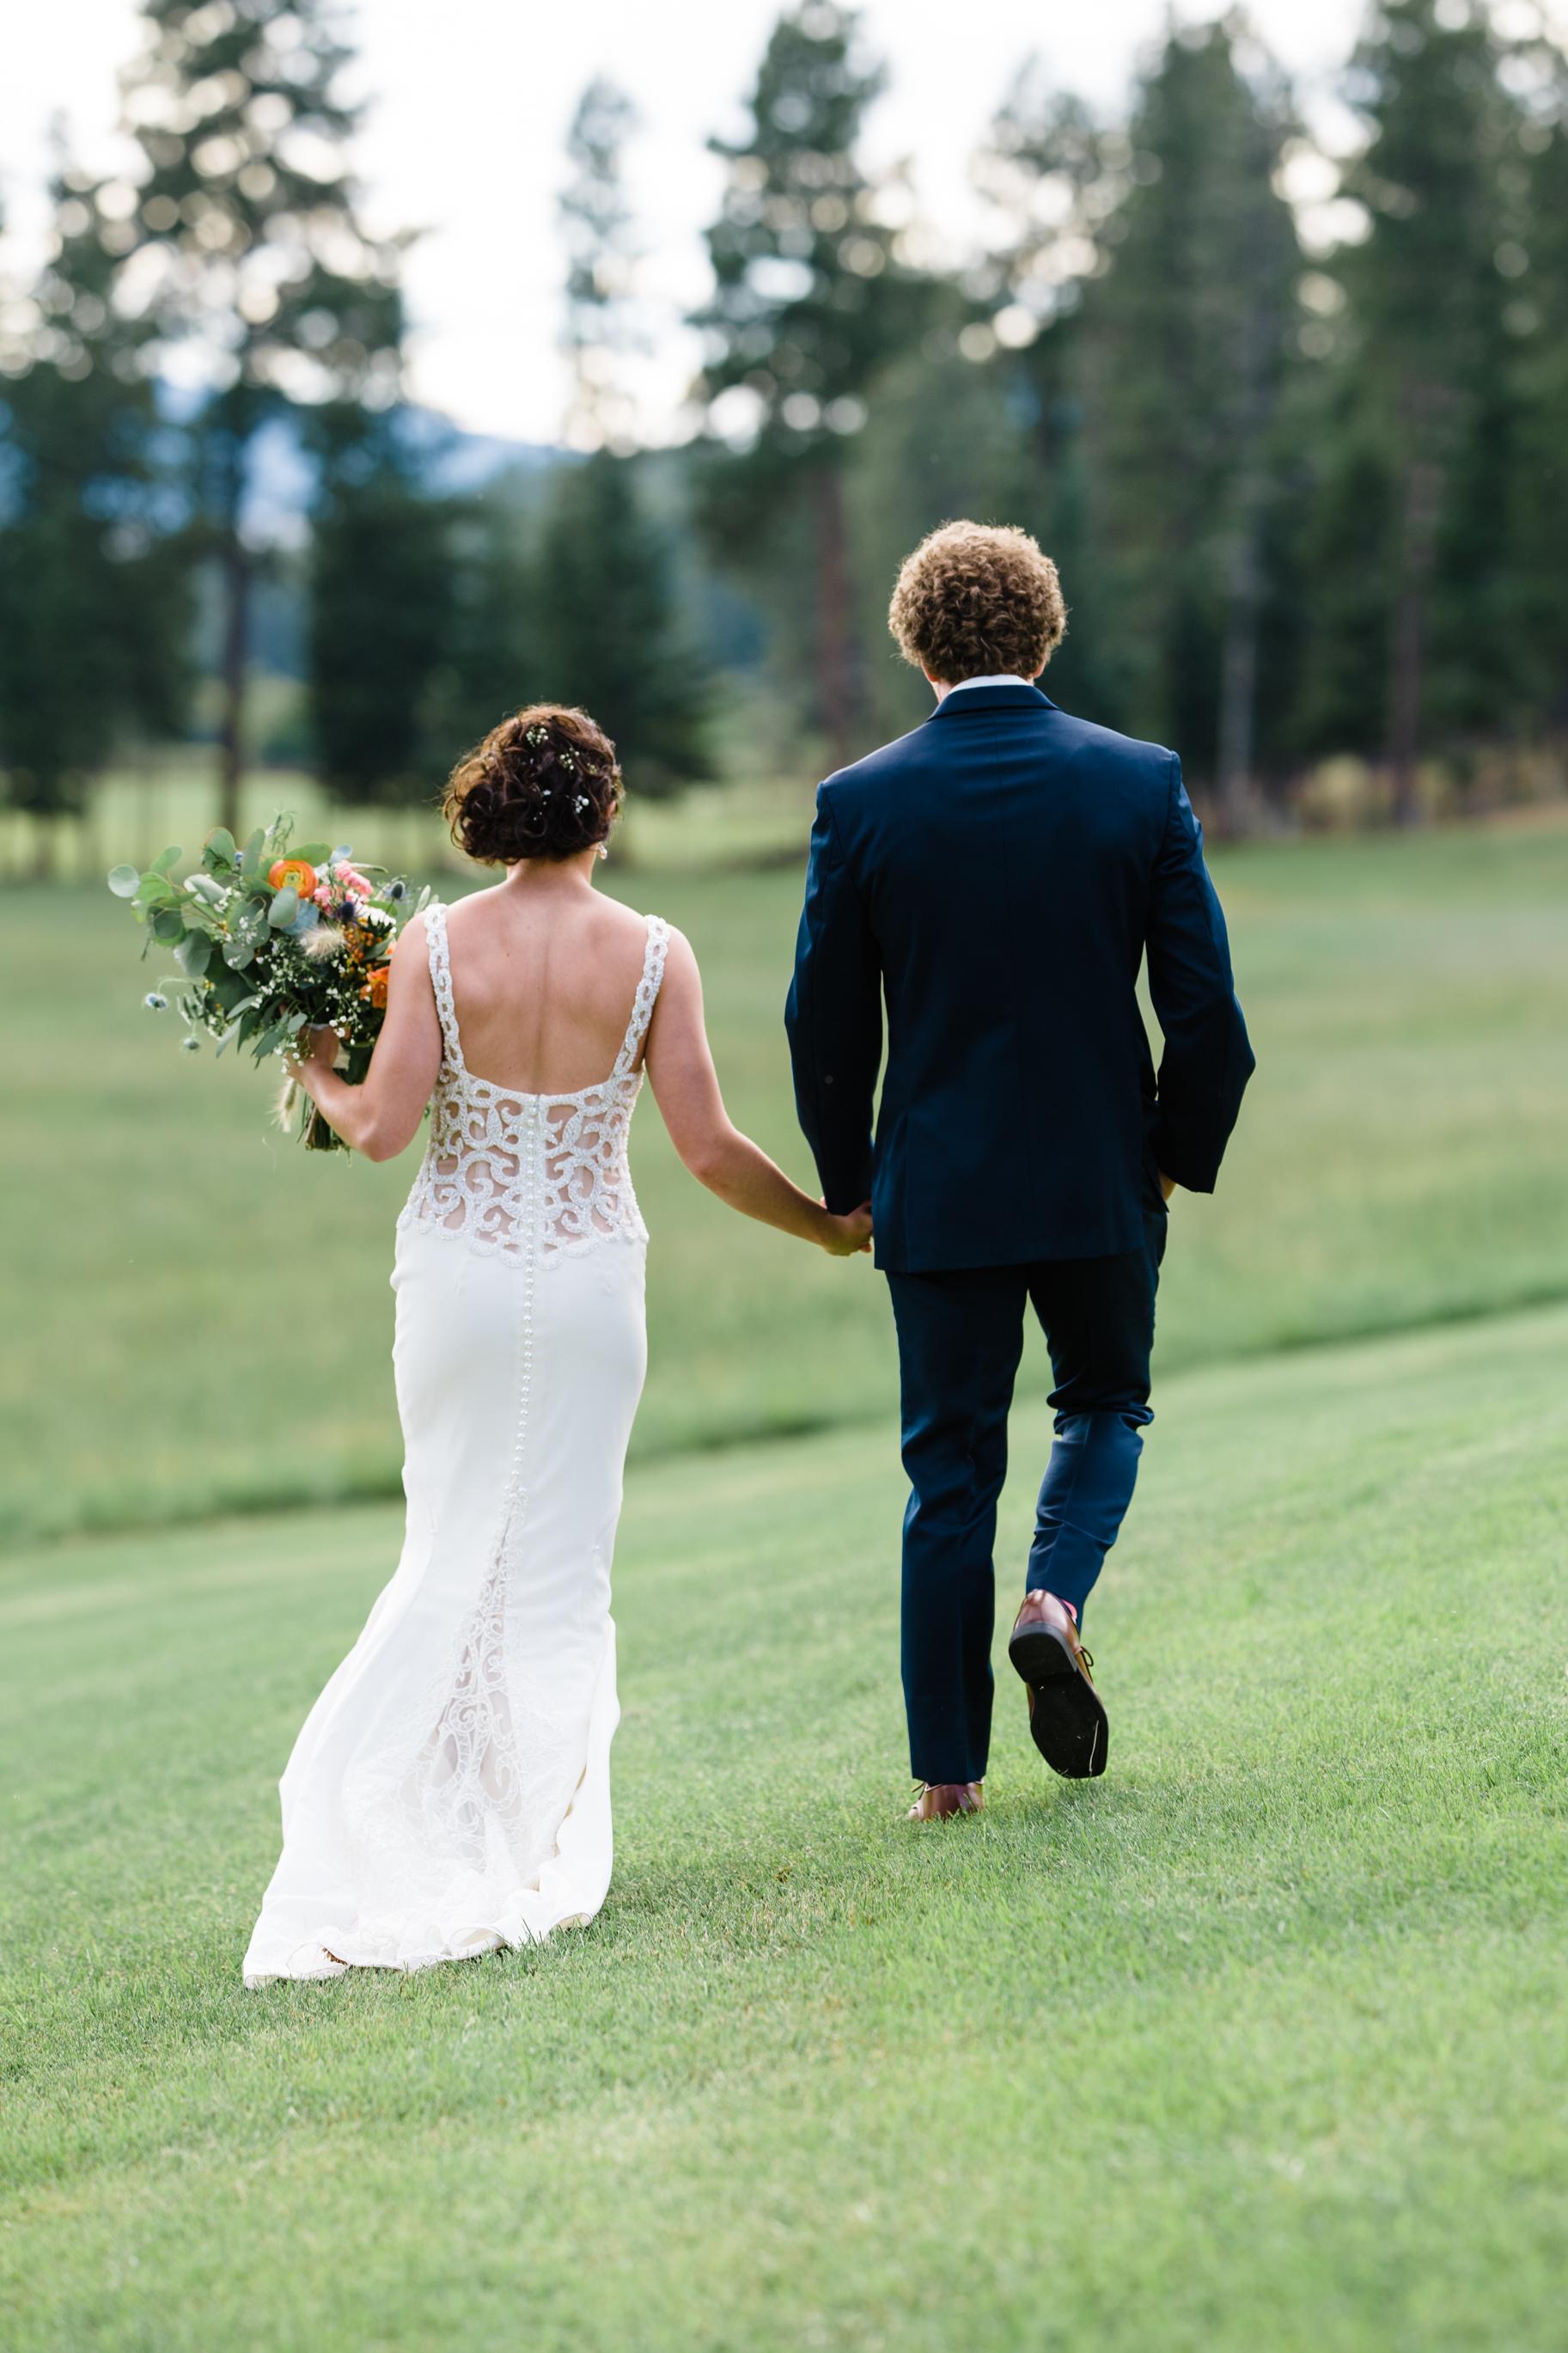 017The Barn at Finley Point Wedding_Montana Wedding Photographer_Katy & Bryce_July 20, 2019-455.jpg